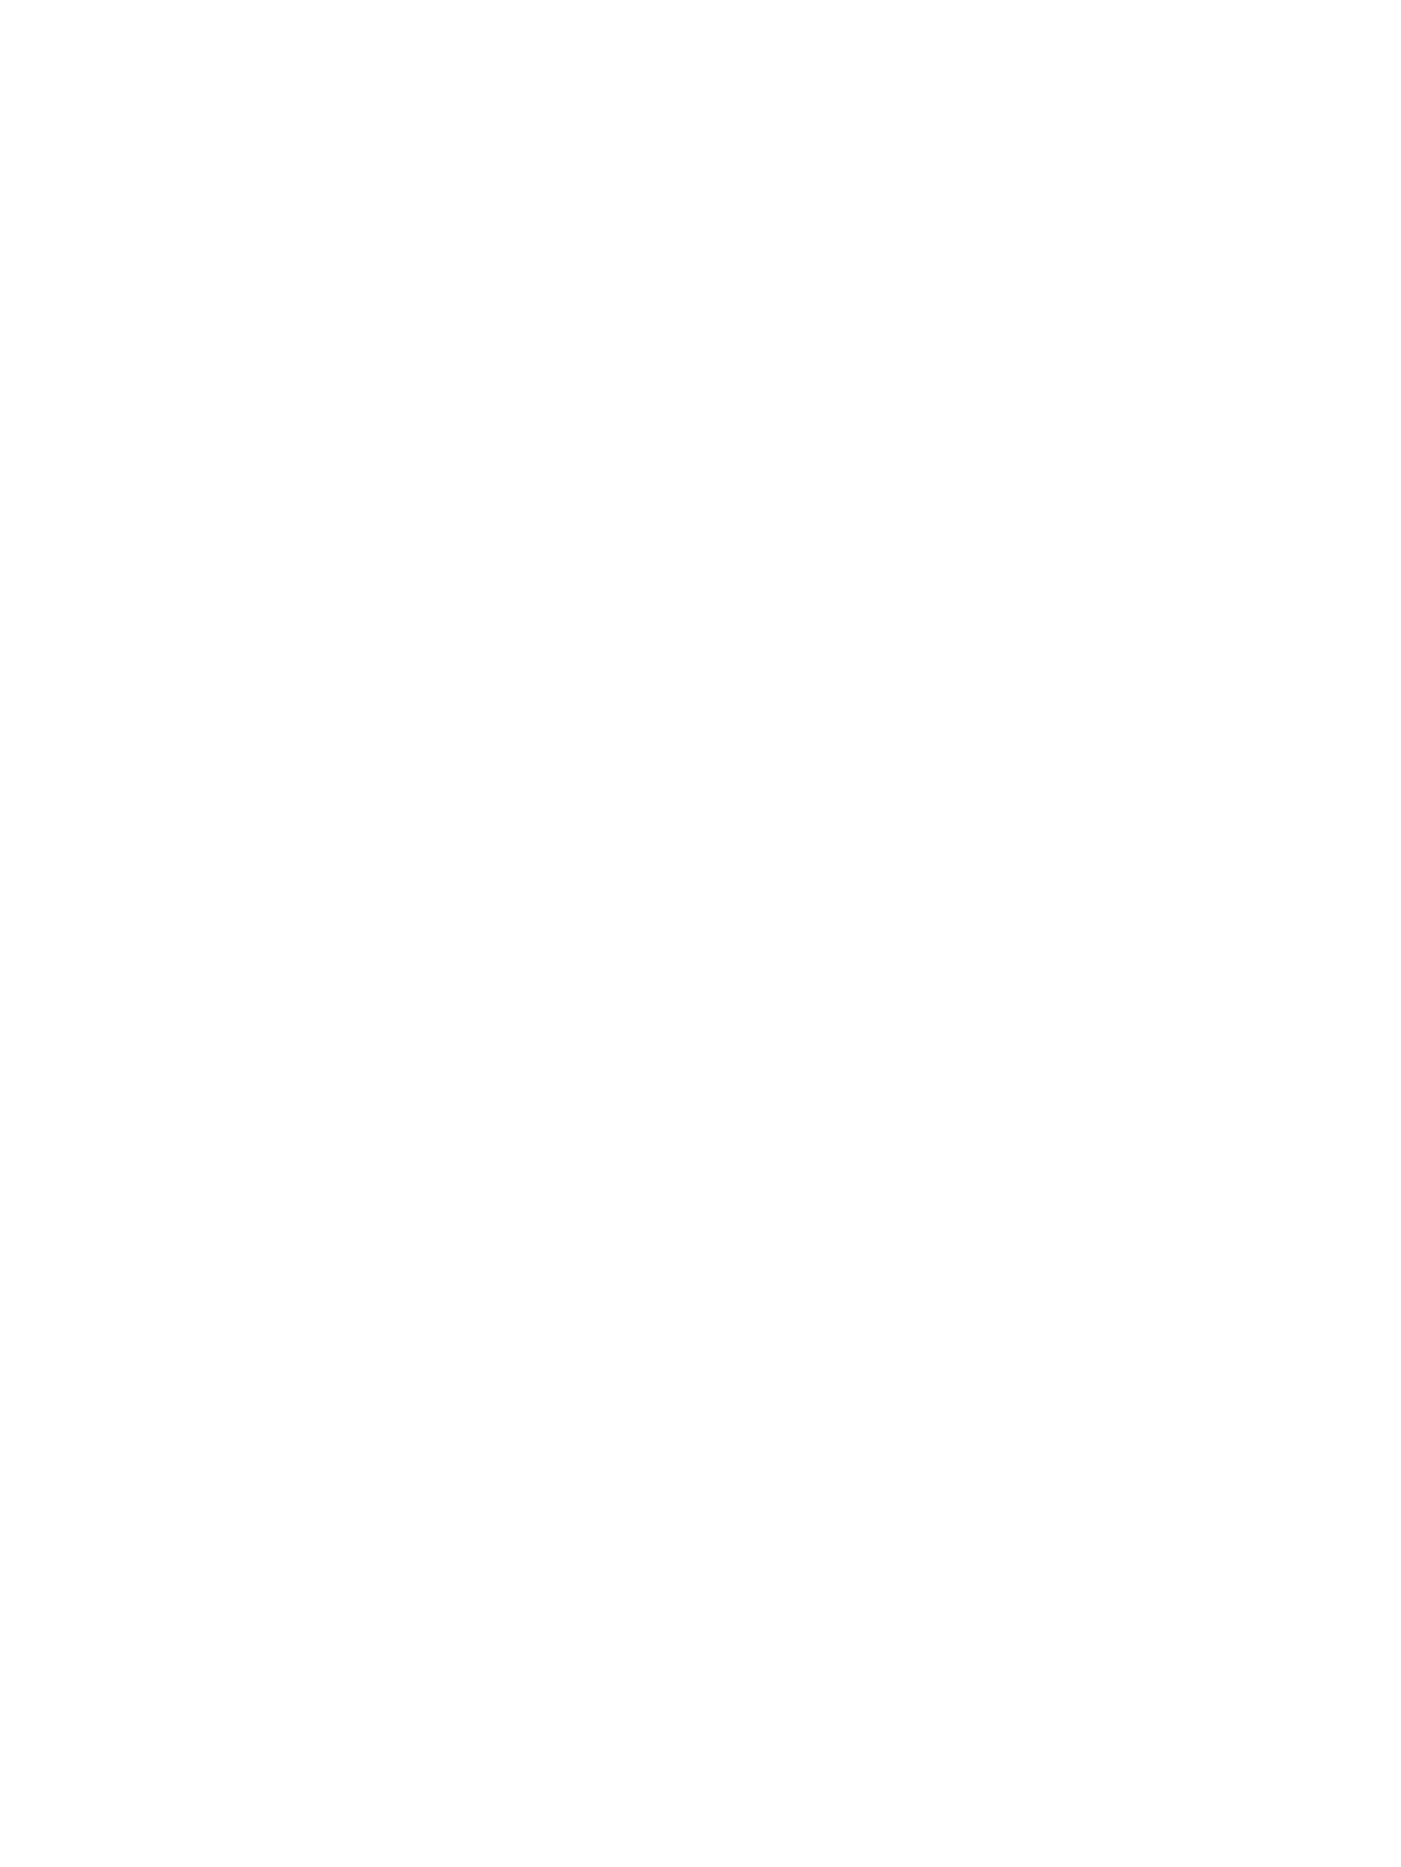 Трусы стринг vendetta londonБюстье<br>трусы<br><br>Цвет: Голубой<br>Декор: None<br>Стилистика: None<br>Направление: Бюстье<br>Пол: Женский<br>Материал: 64%ПА; 22%ЭЛ; 14%ХЛ<br>Размер RU: 42